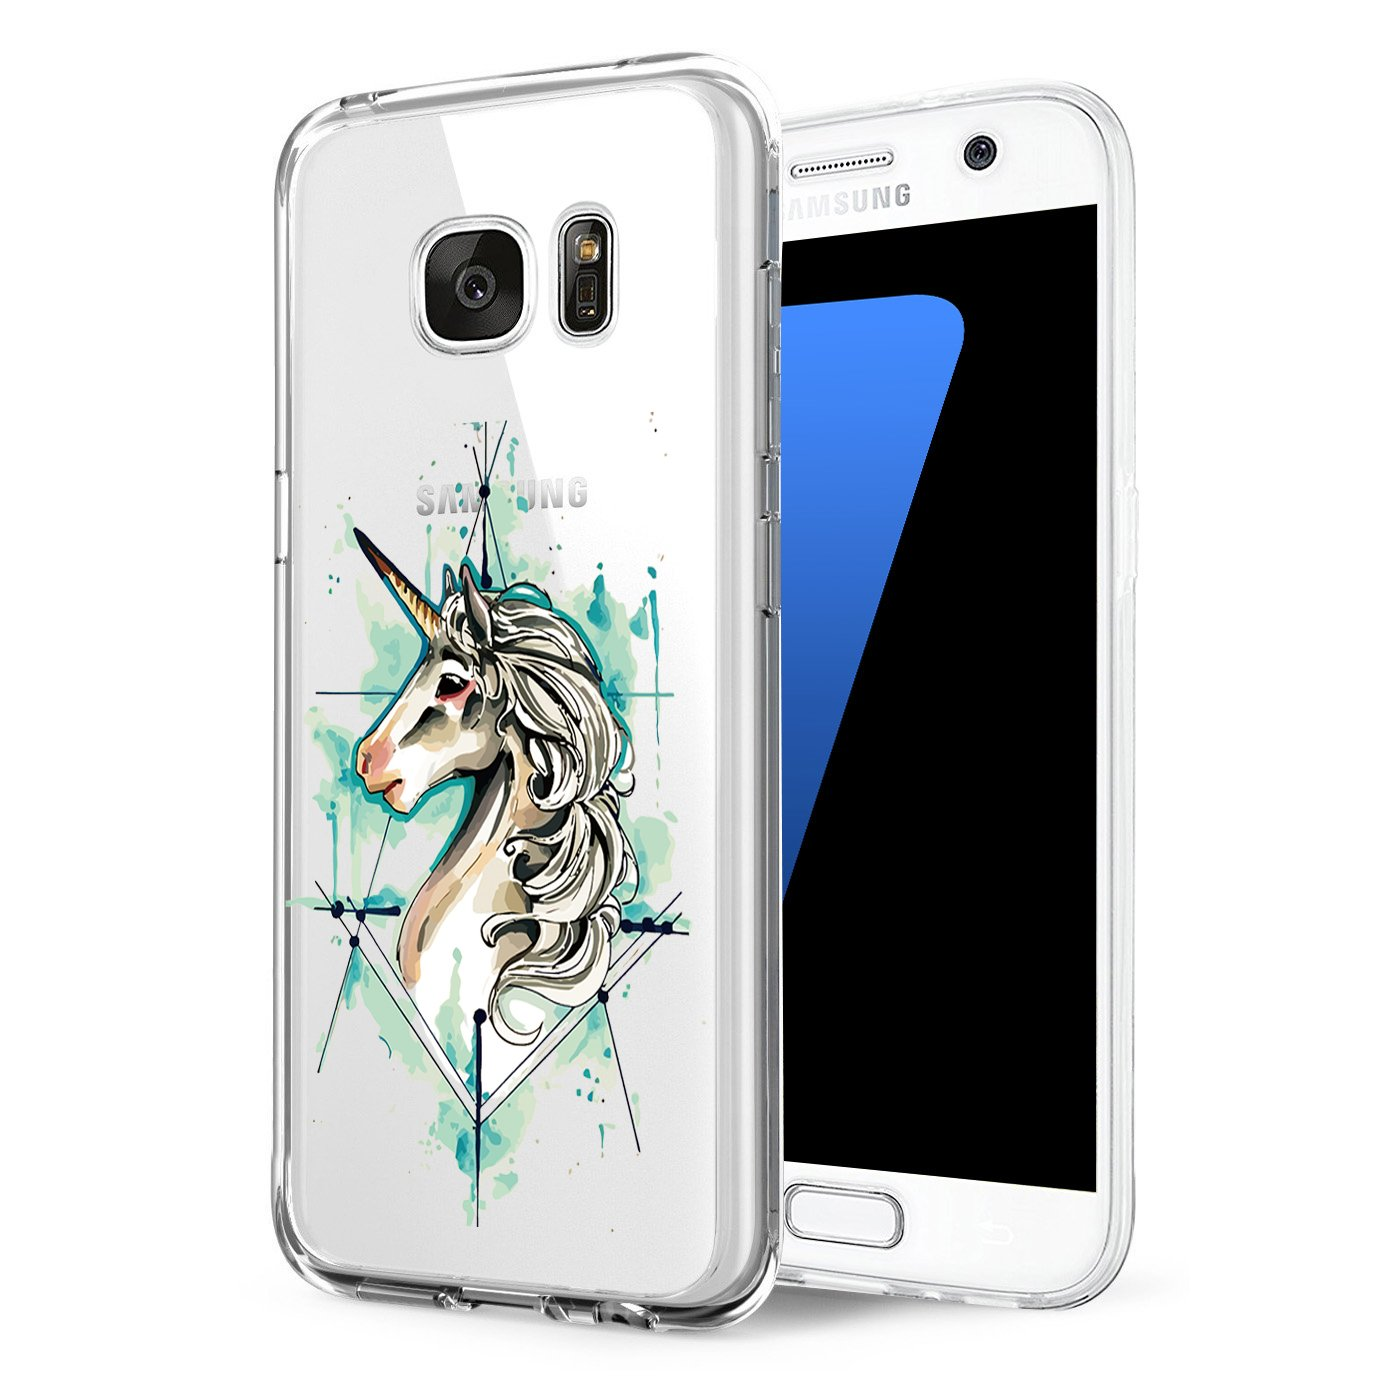 Eari Samsung S6 Case, TPU Silicone Rubber Cute Anti-Scratch Slim Ultra Protective Clear Shock-Absorption Bumper Soft Amusing Design for Samsung Galaxy S6 5.1 zoll - Black Cover (2, Galaxy S6)